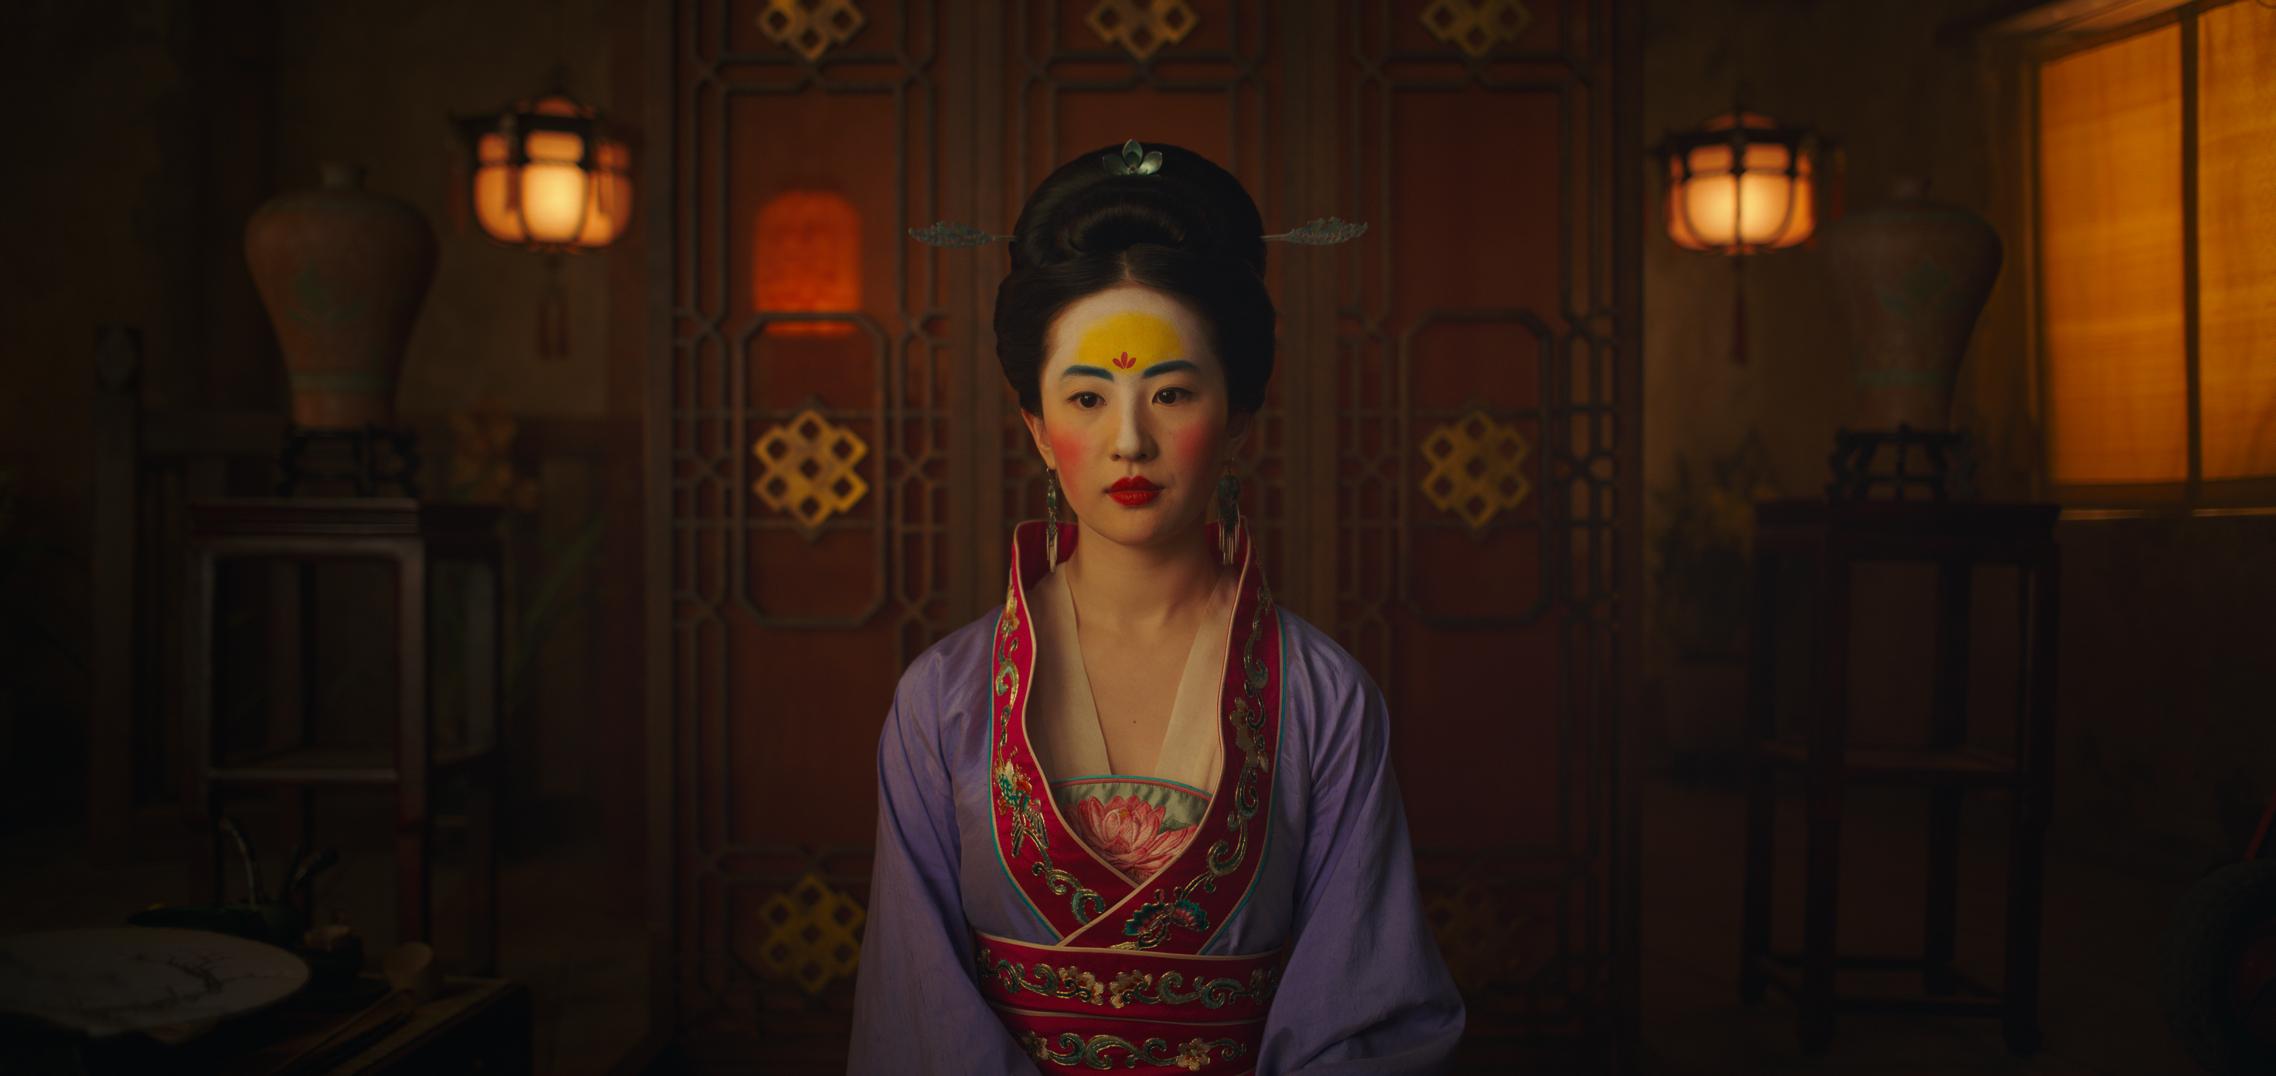 Disney Live Action Remake Mulan Unveils 14 New Images Poster 2276x1076